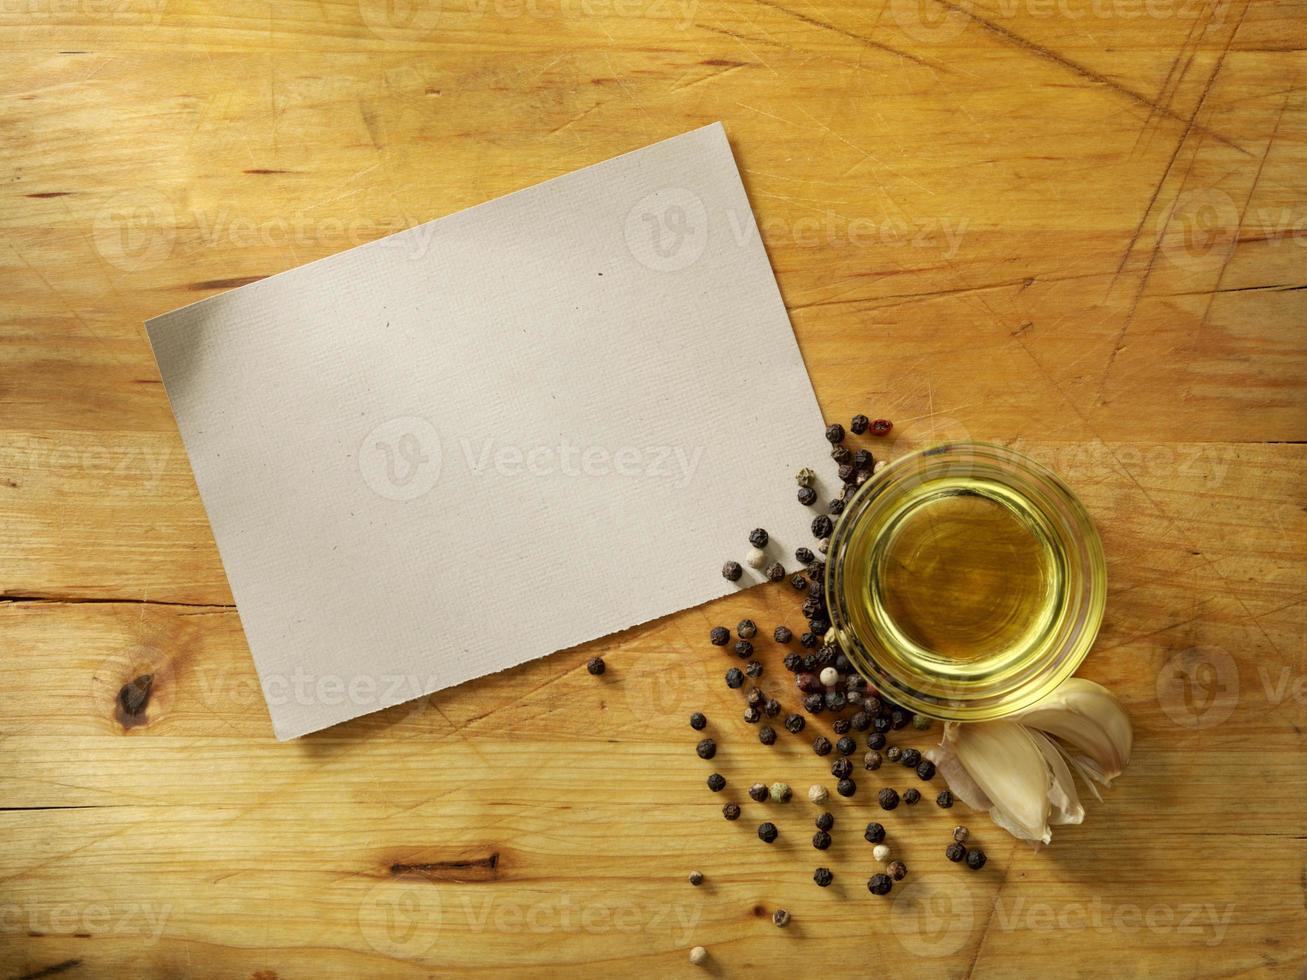 Rezeptkarte mit Olivenöl foto